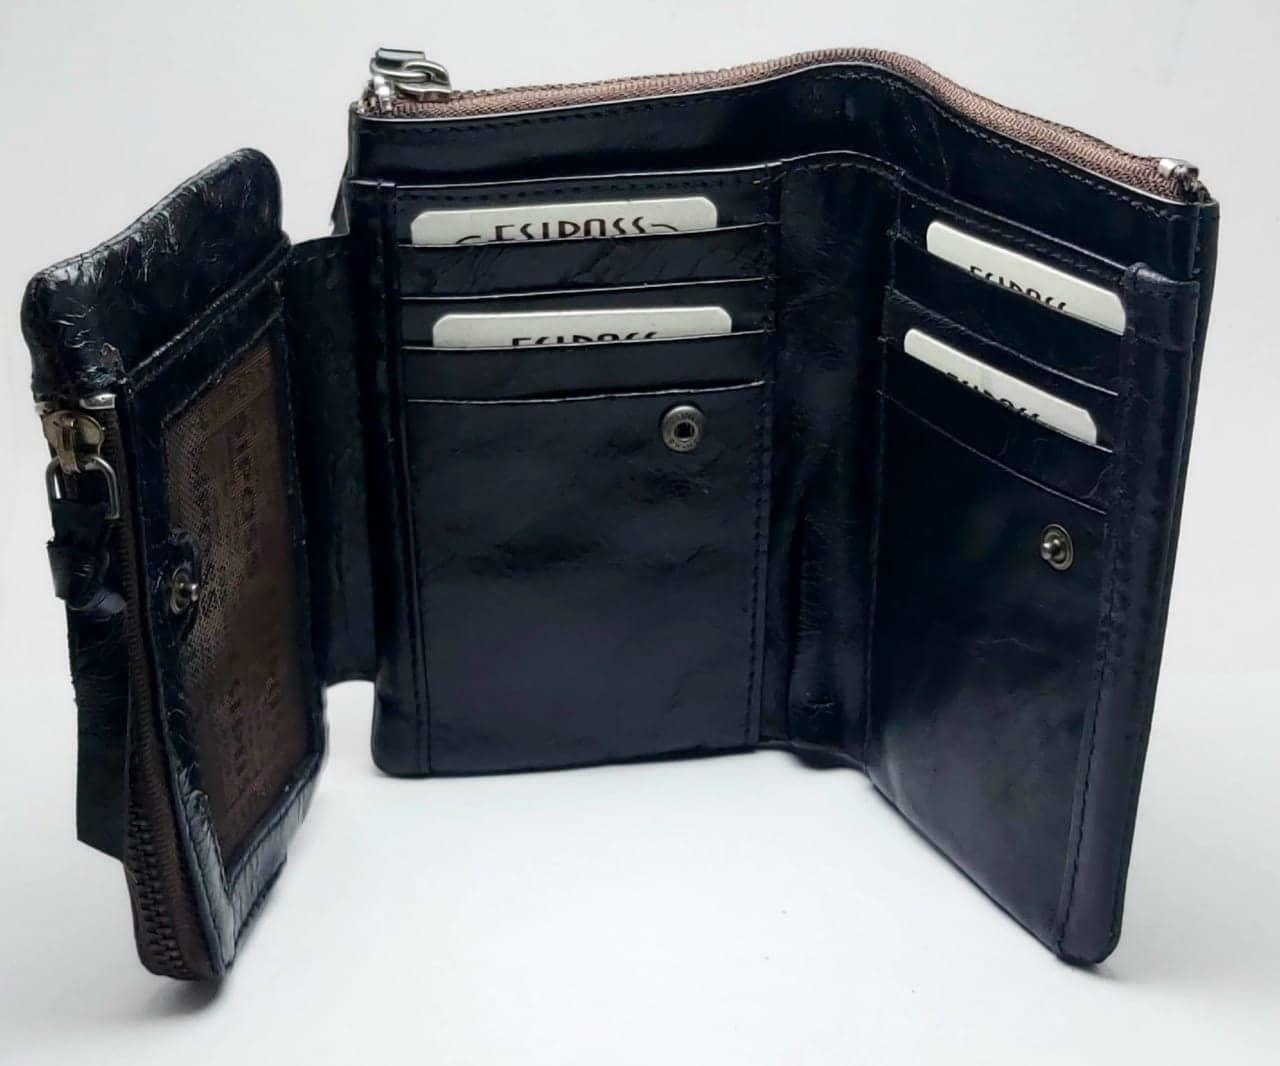 ESIPOSS Wallet EP06 Men Genuine Leather Men Purse Vintage With Zipper Coin Pocket Famous Brand Designer Wallets For Men Money Bag